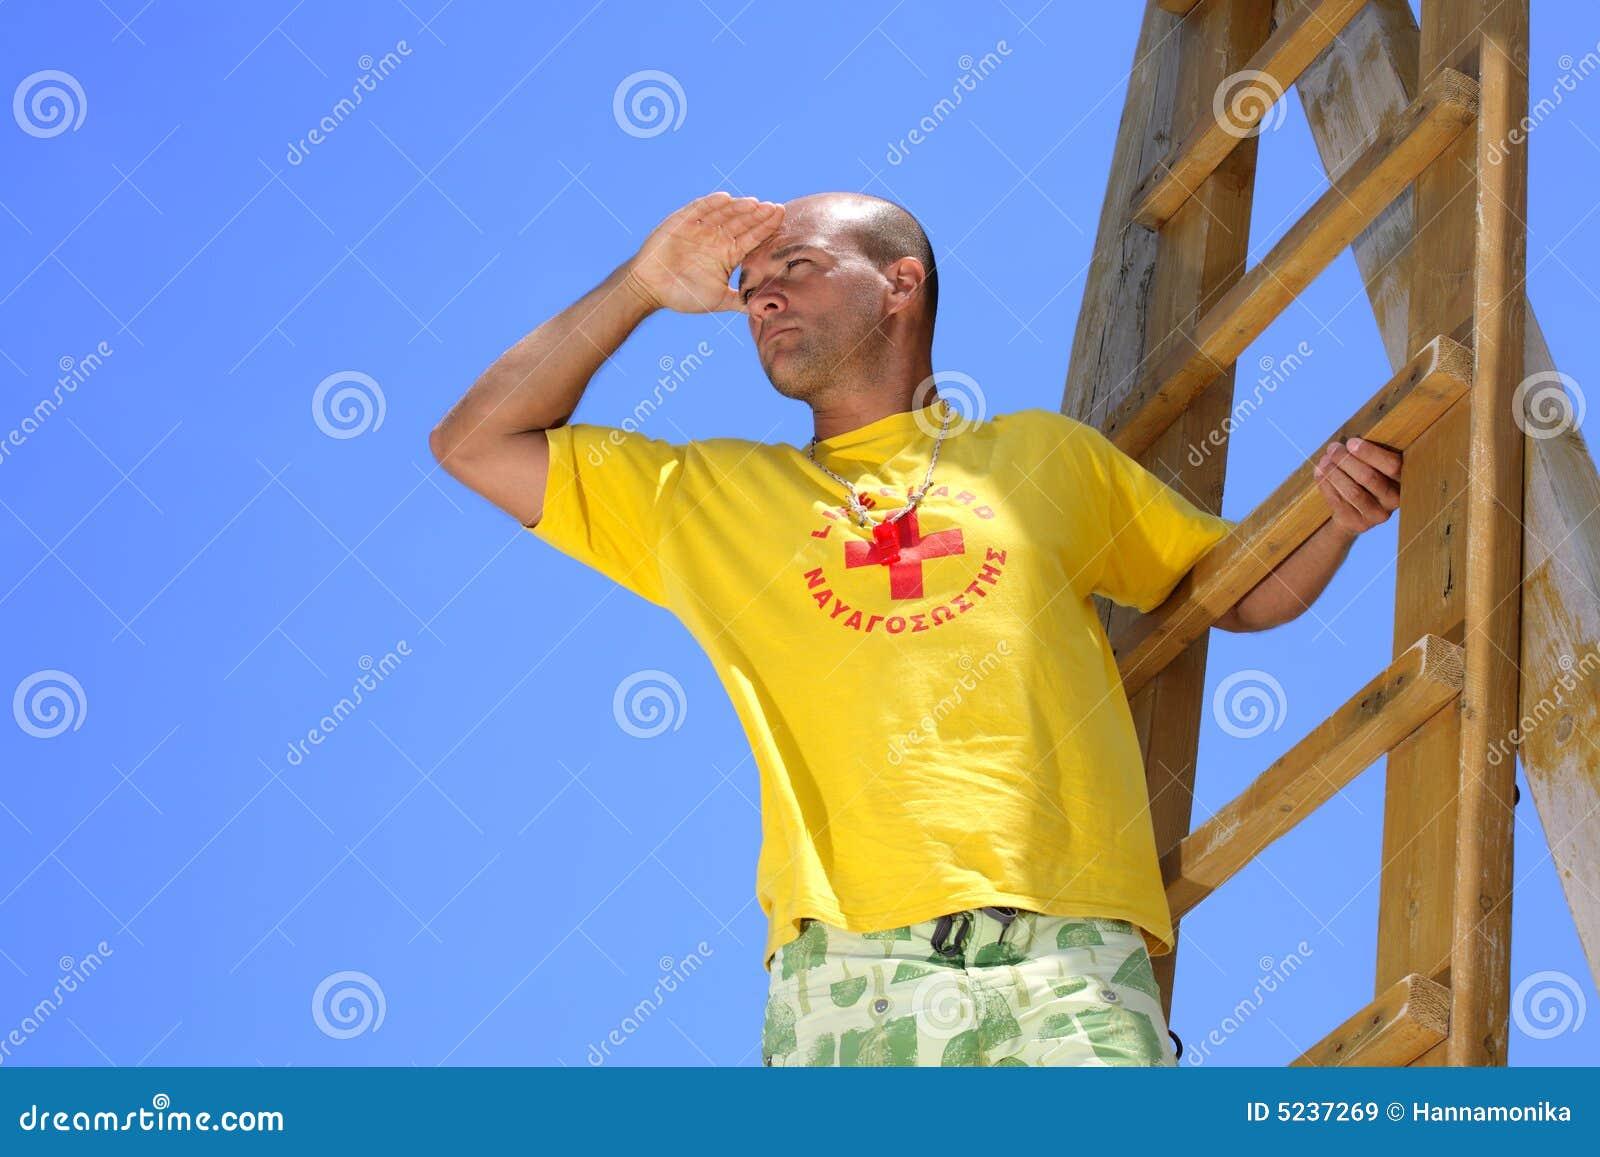 Lifeguard on duty